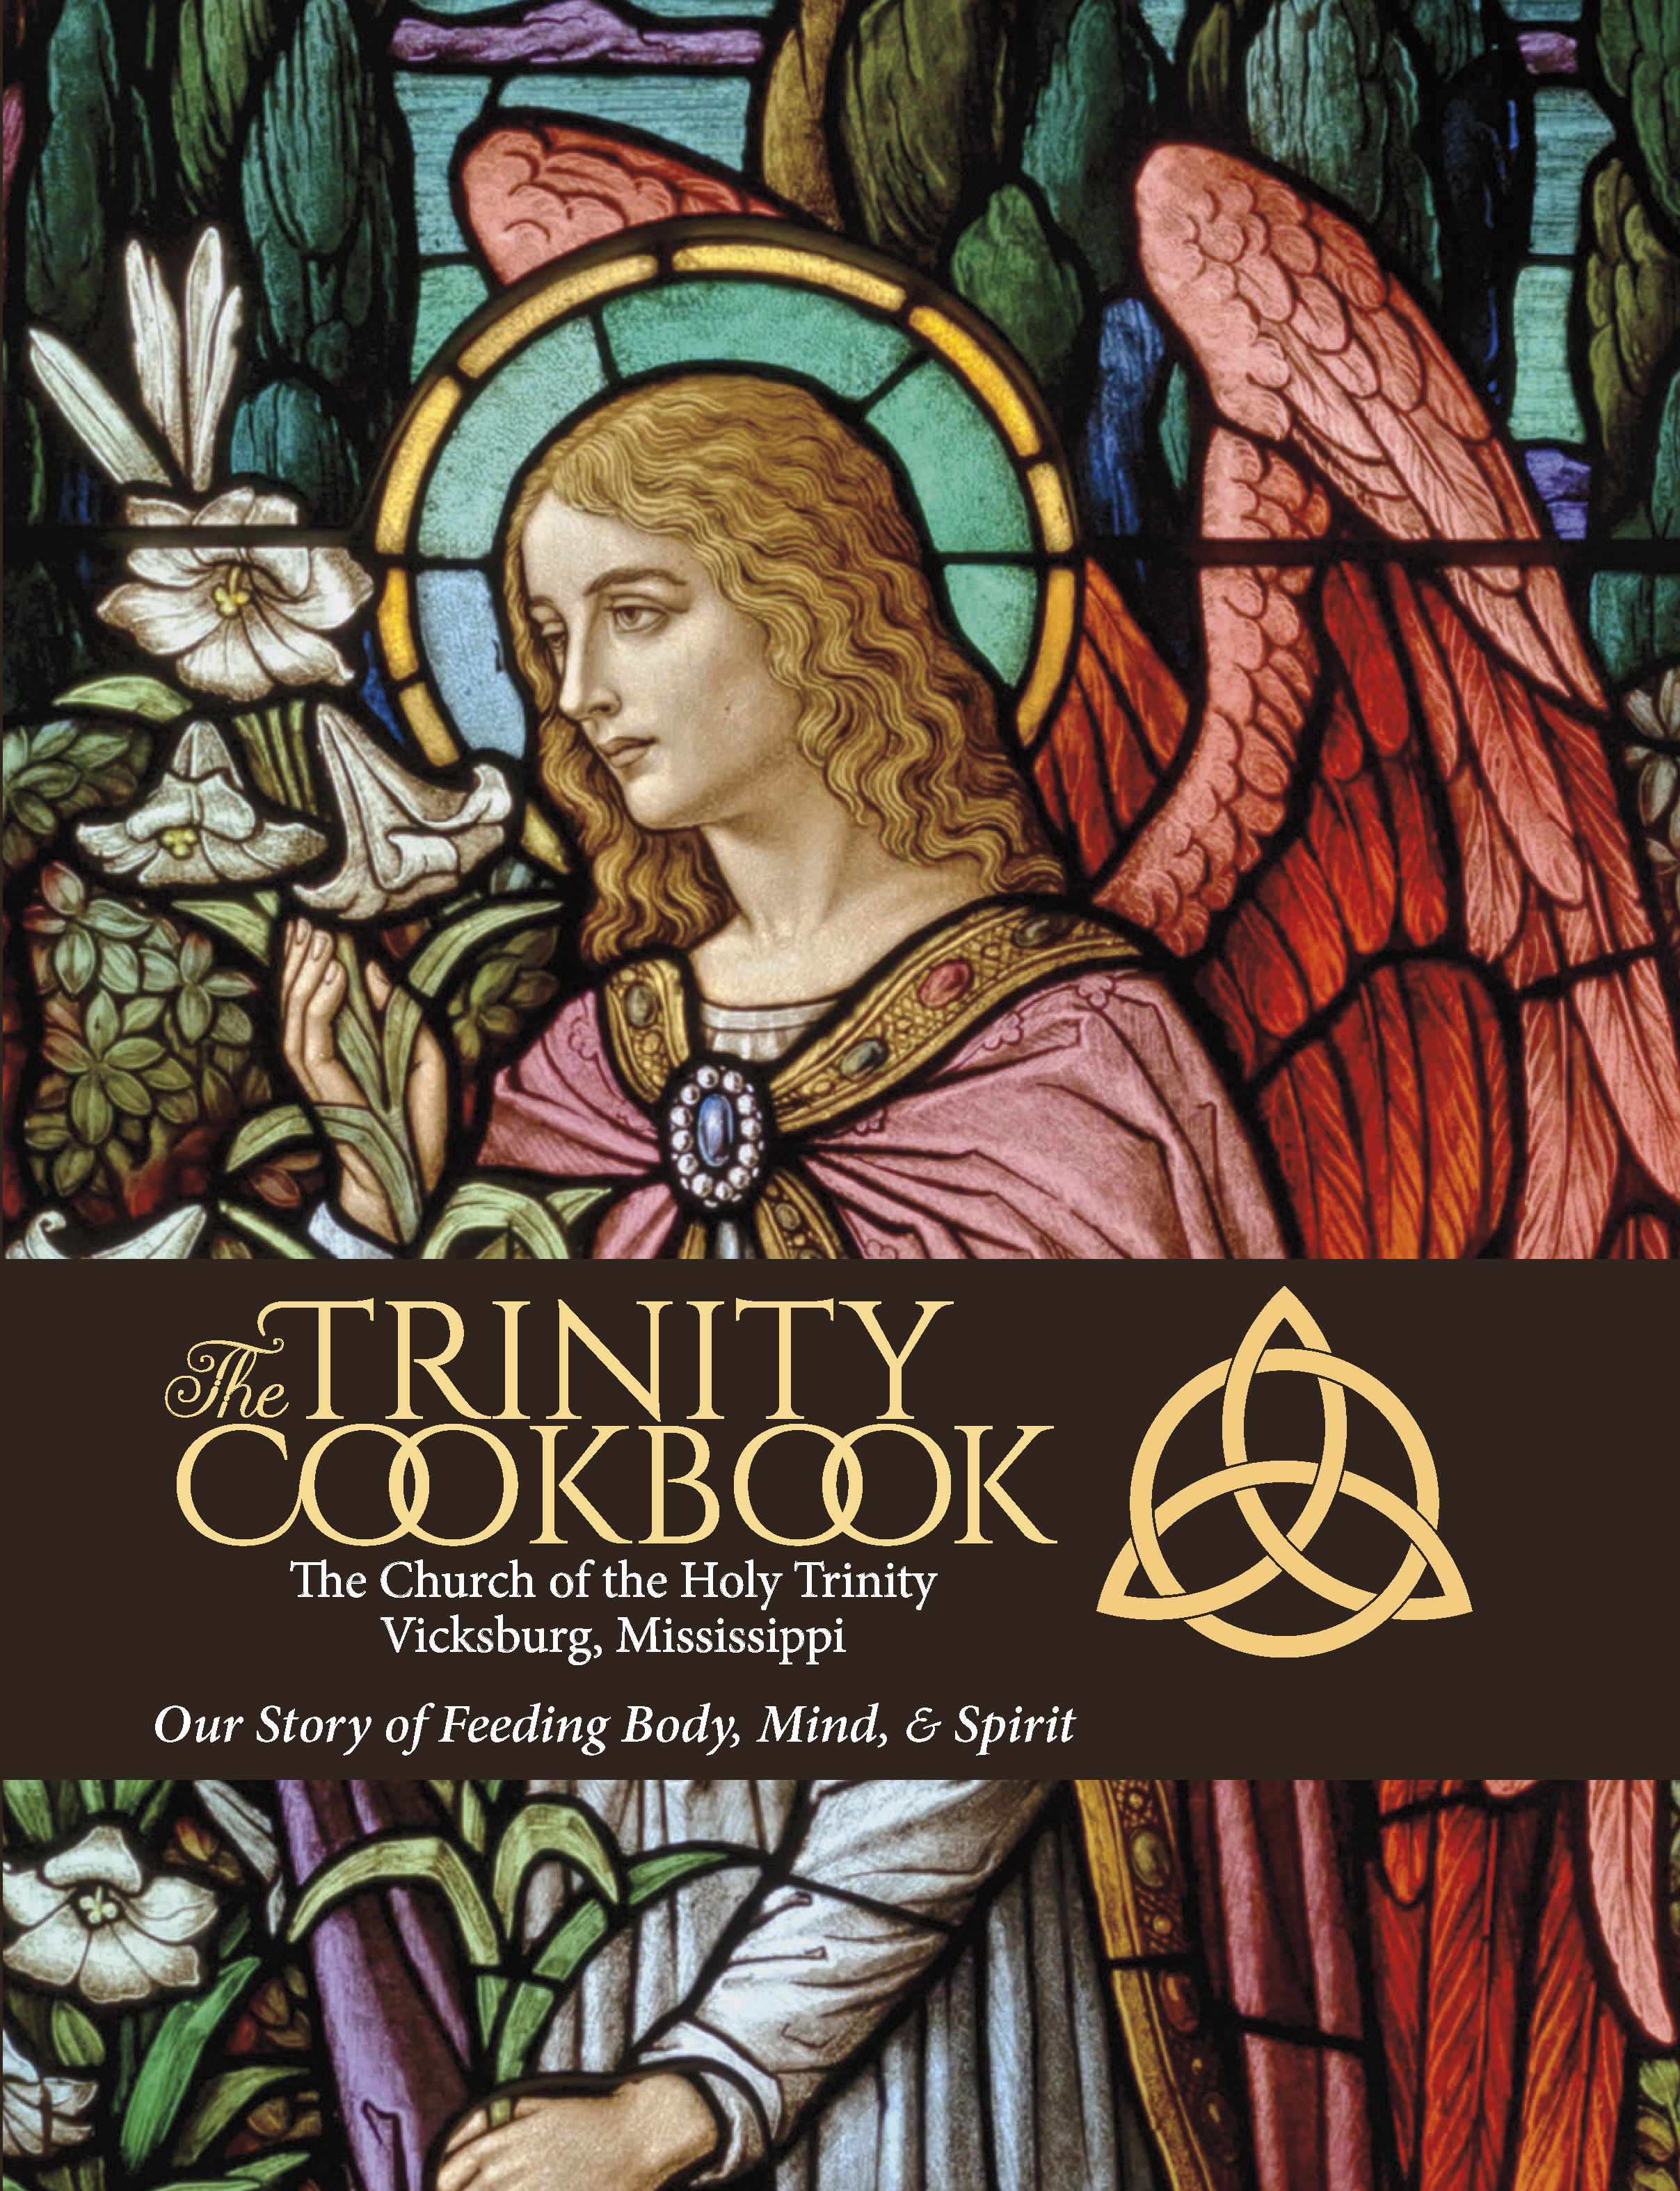 The Trinity Cookbook 00000